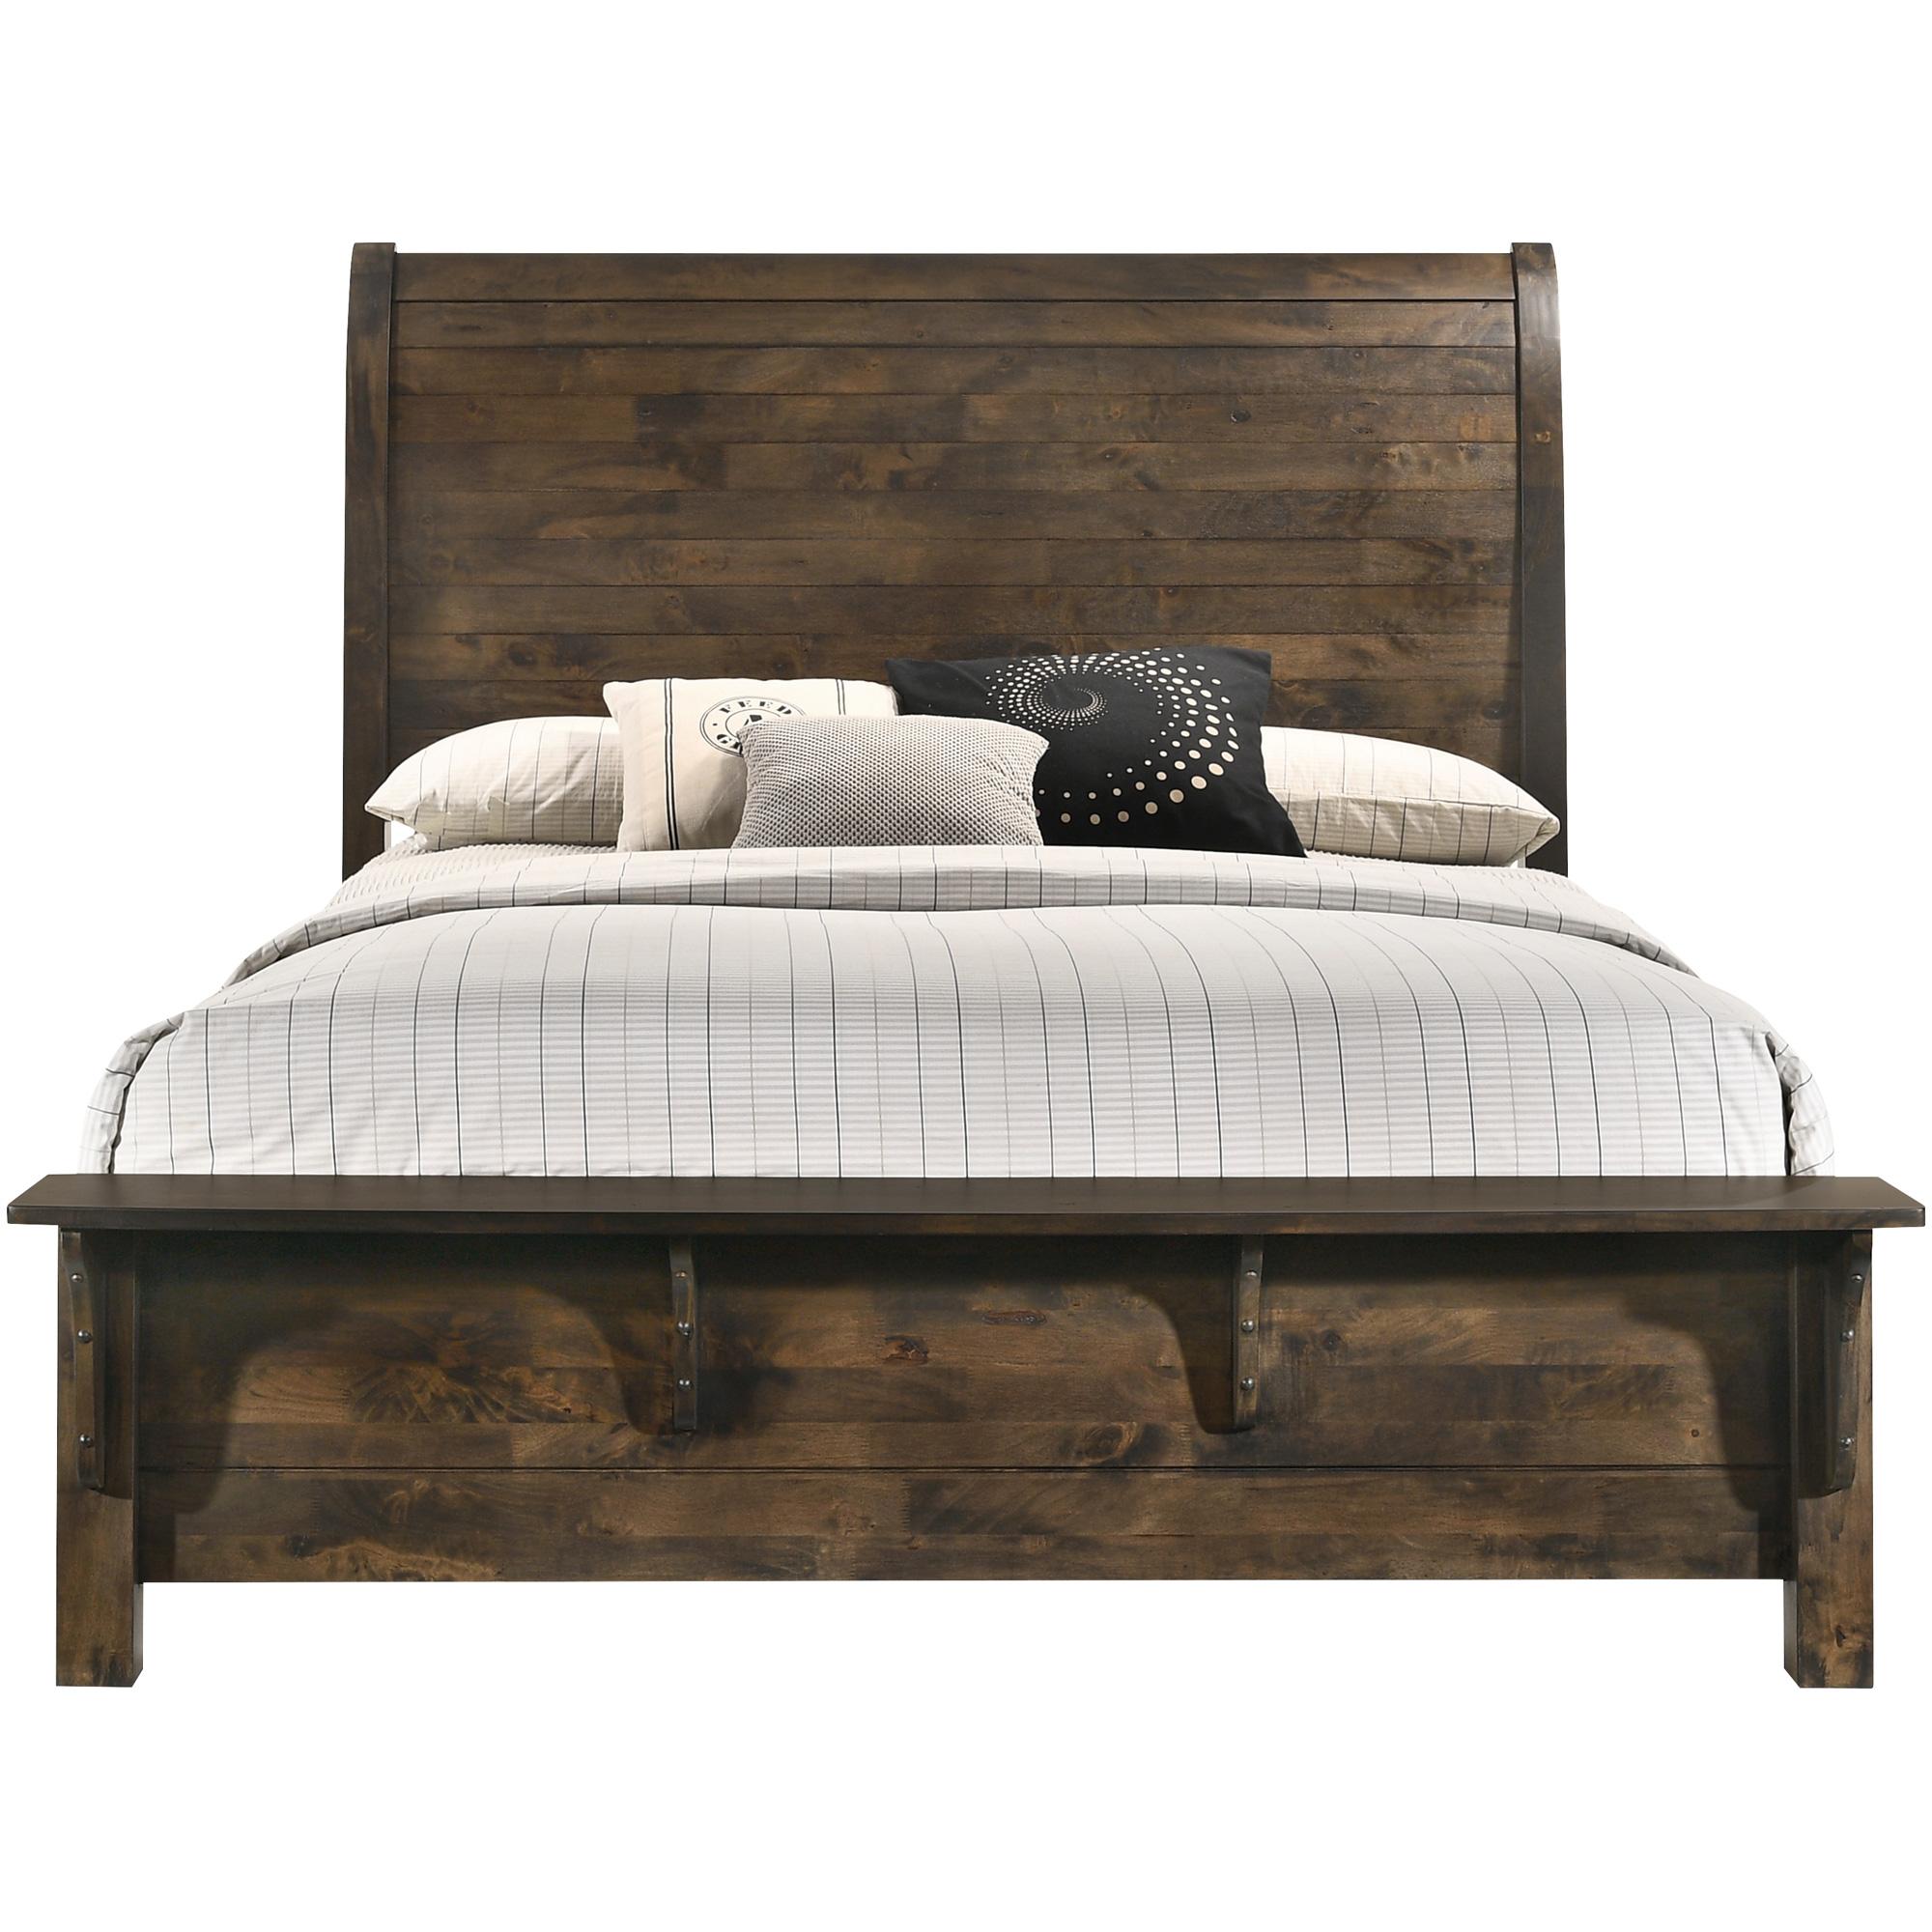 New Classic | Blue Ridge Rustic Gray Queen Bed